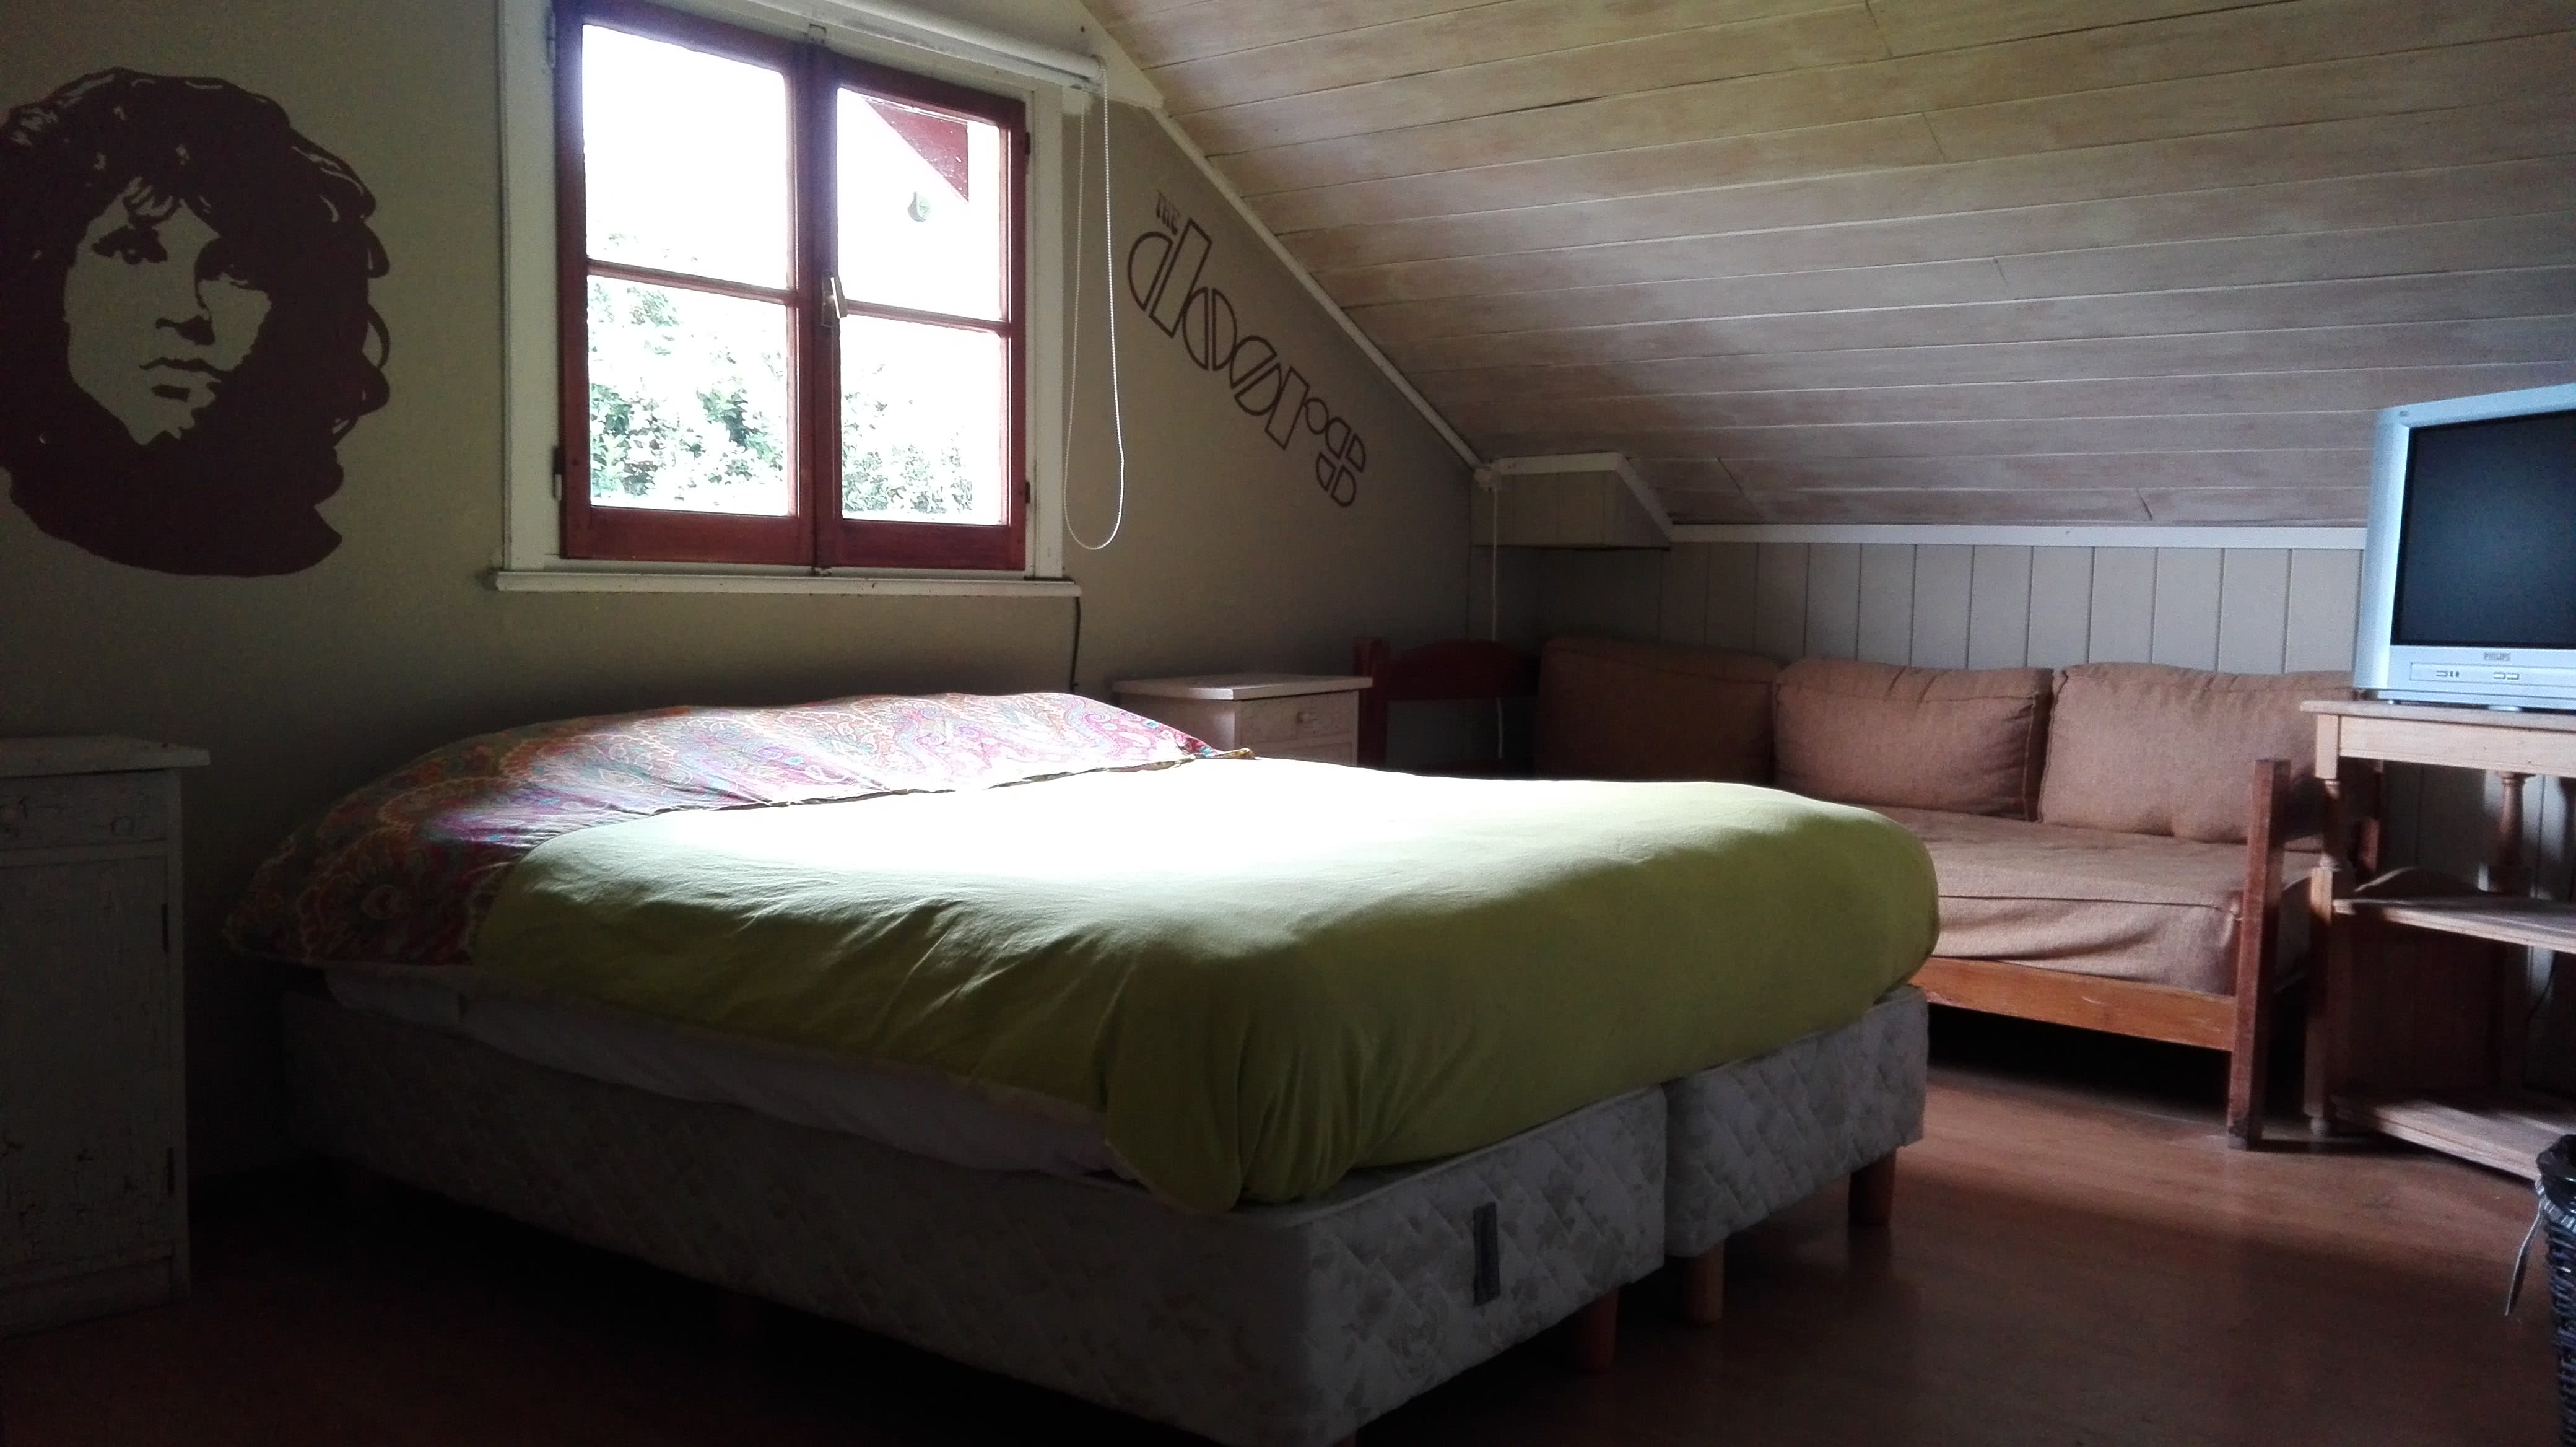 Hostel Achalay